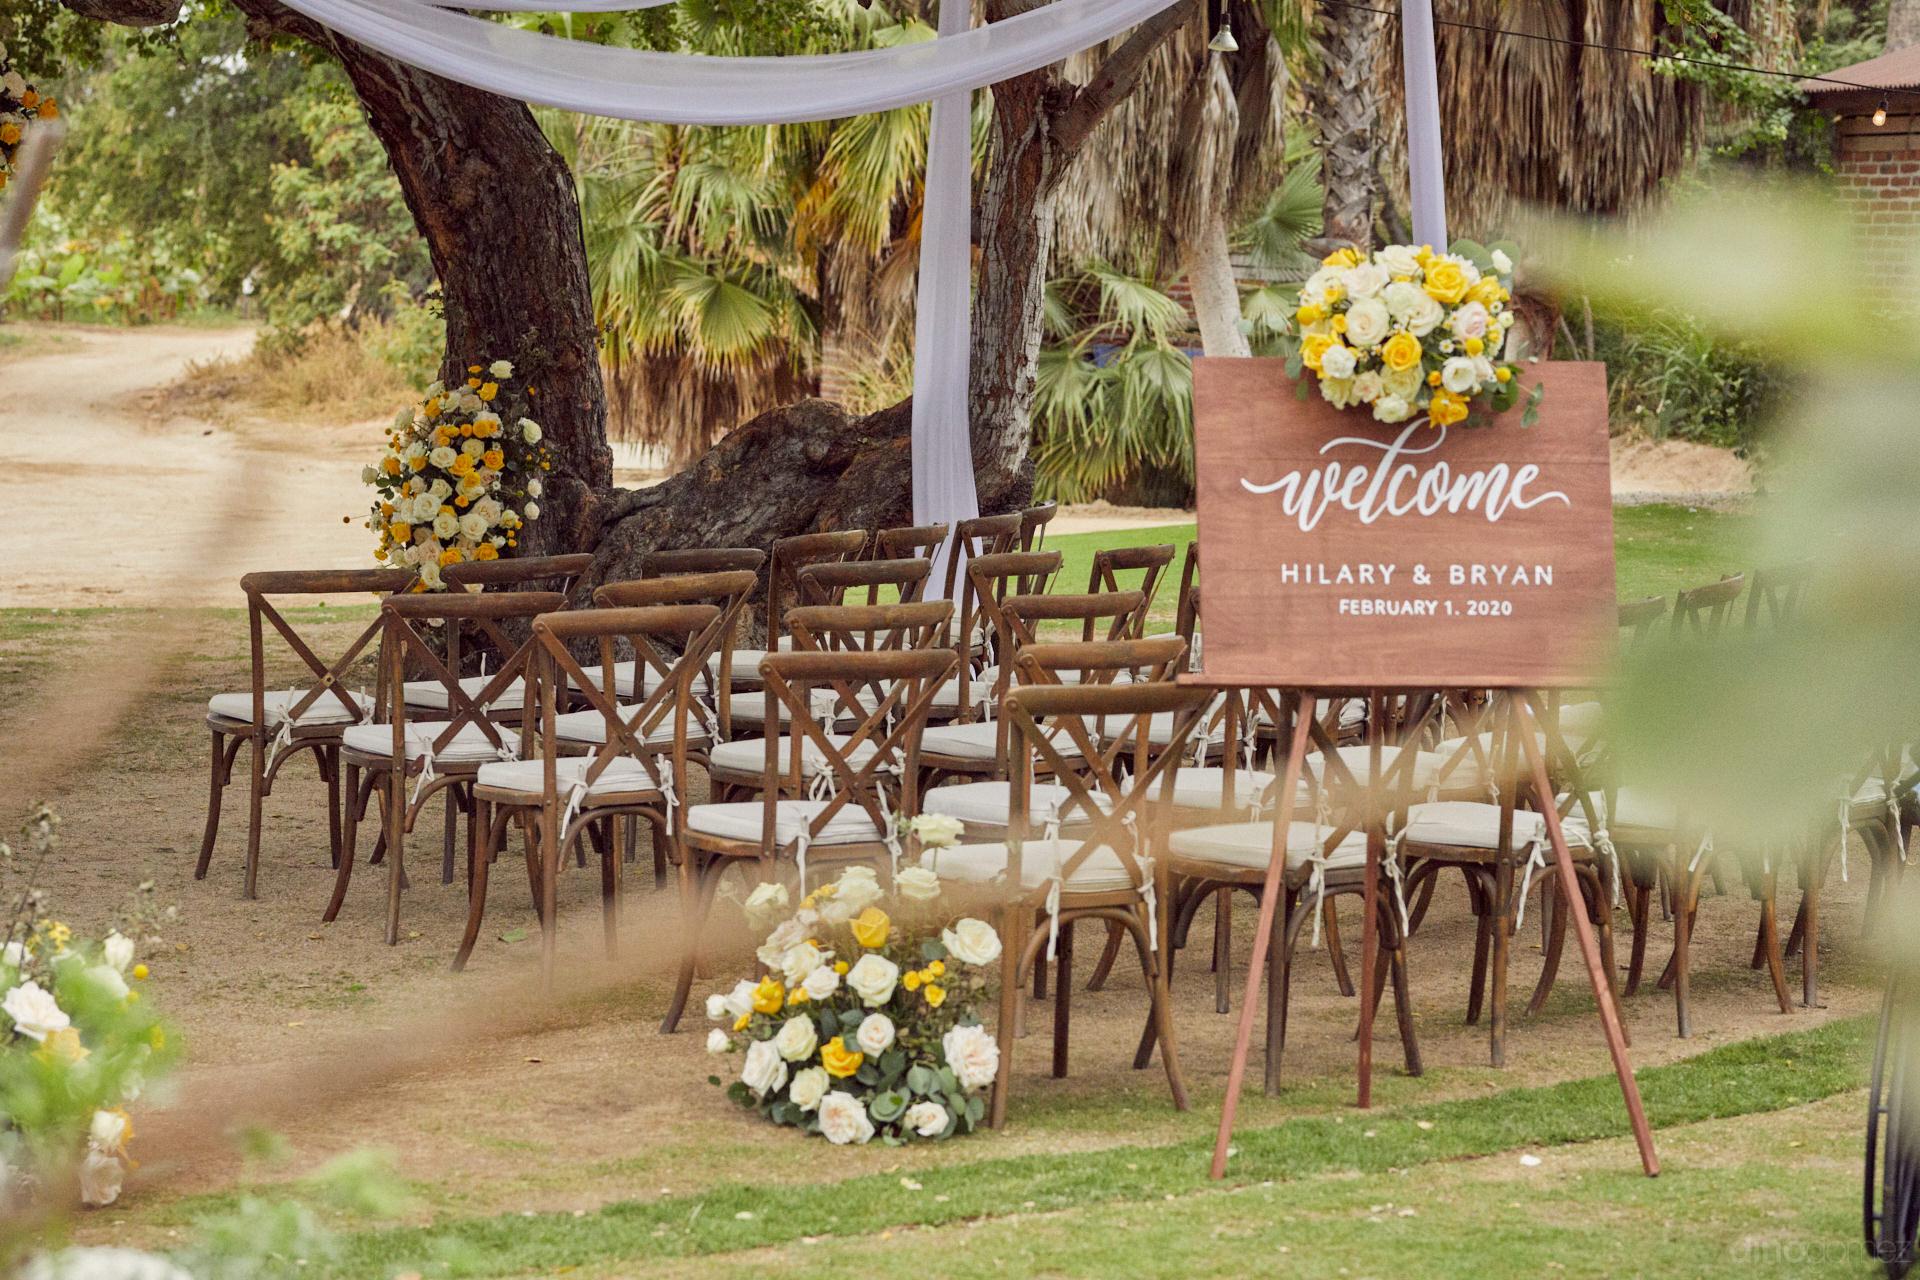 Jw Marriot Hotel Near Flora Farms Ideal For Cabo Weddings - Hilary & Bryan Flora Wedding